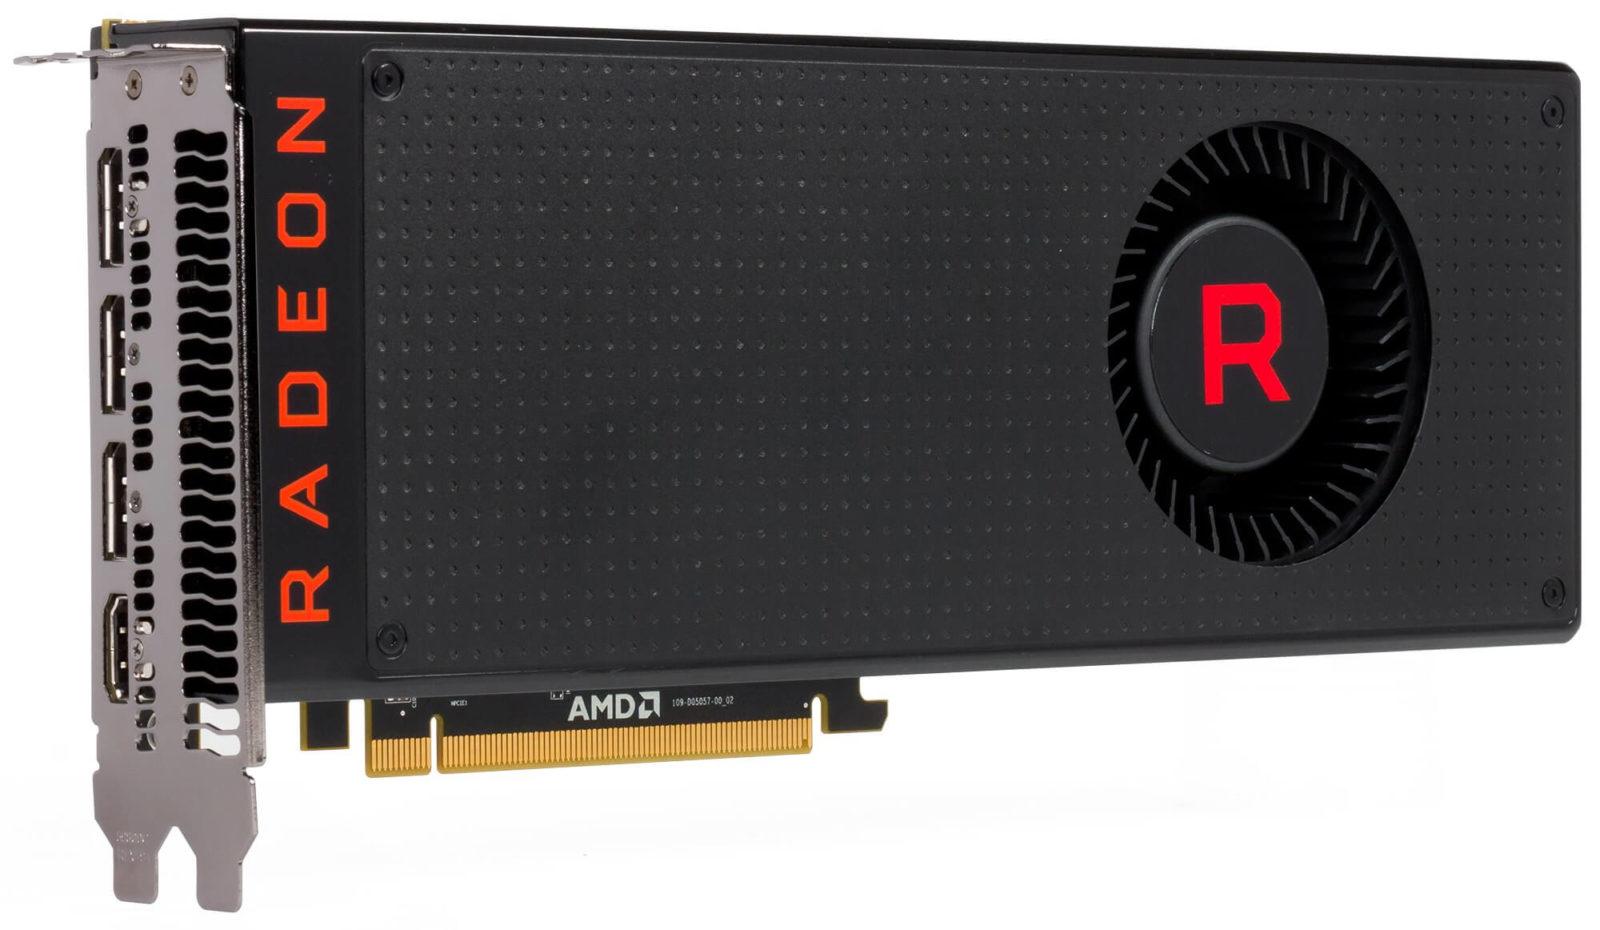 Особенности майнинга на видеокарте AMD Radeon Vega